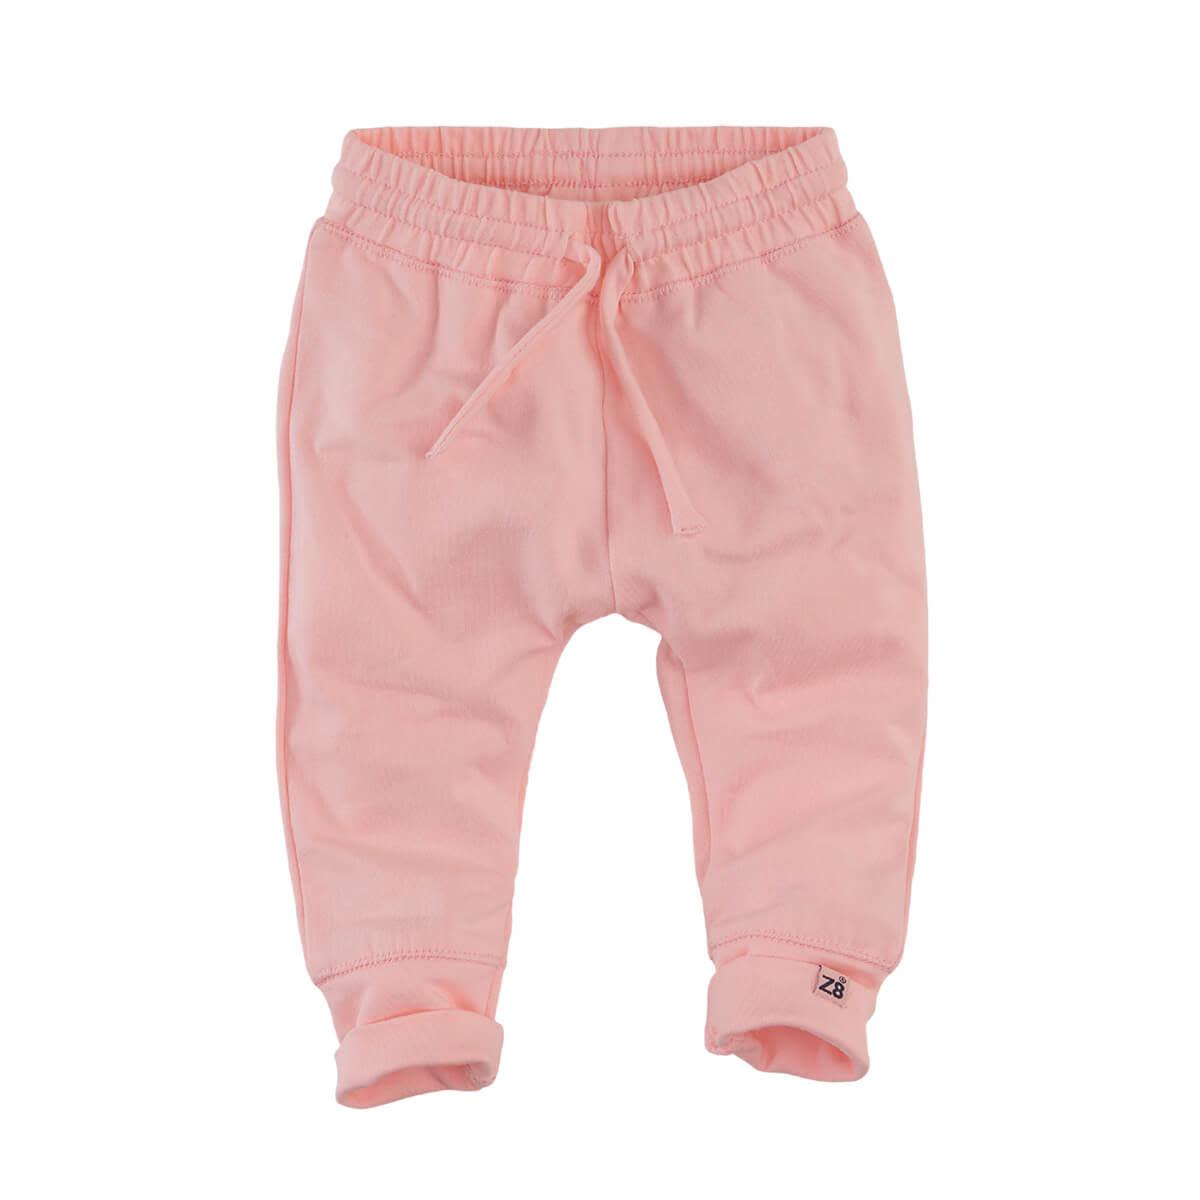 Z8 Dodo N19 - Soft pink